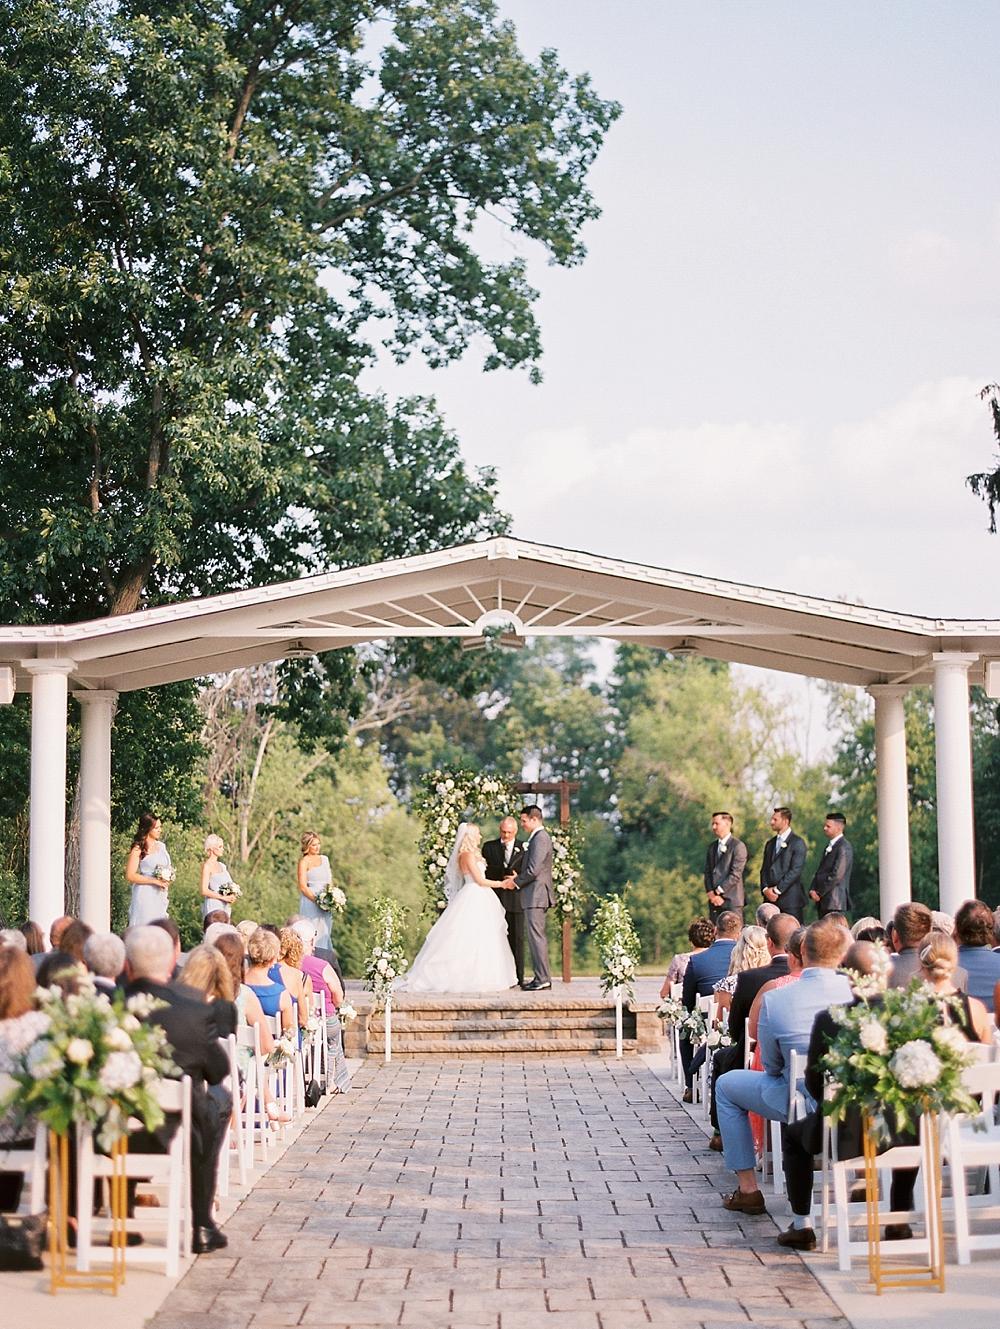 kristin-la-voie-photography-lehmann-mansion-wedding-photographer-236